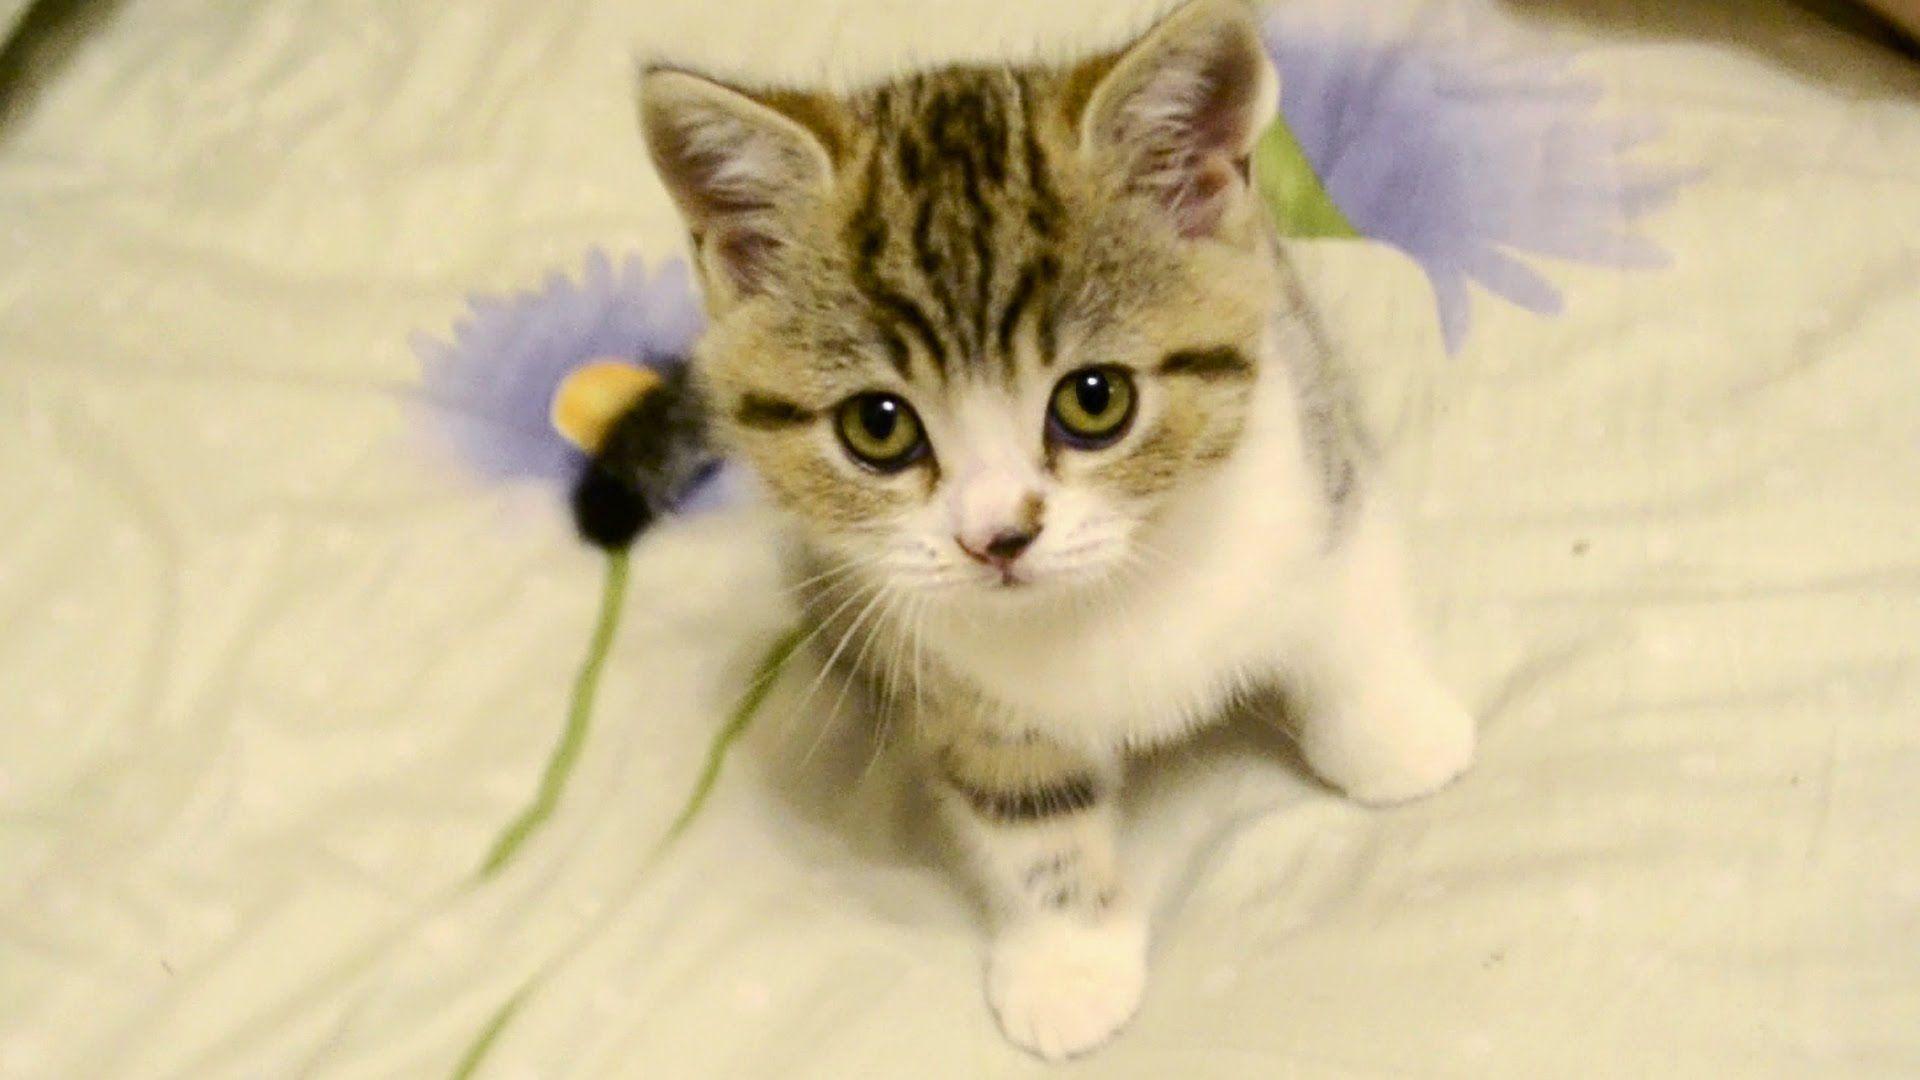 Cute Little Kitten Cute Cute Kitten Gif Cute Little Animals Cute Little Kittens